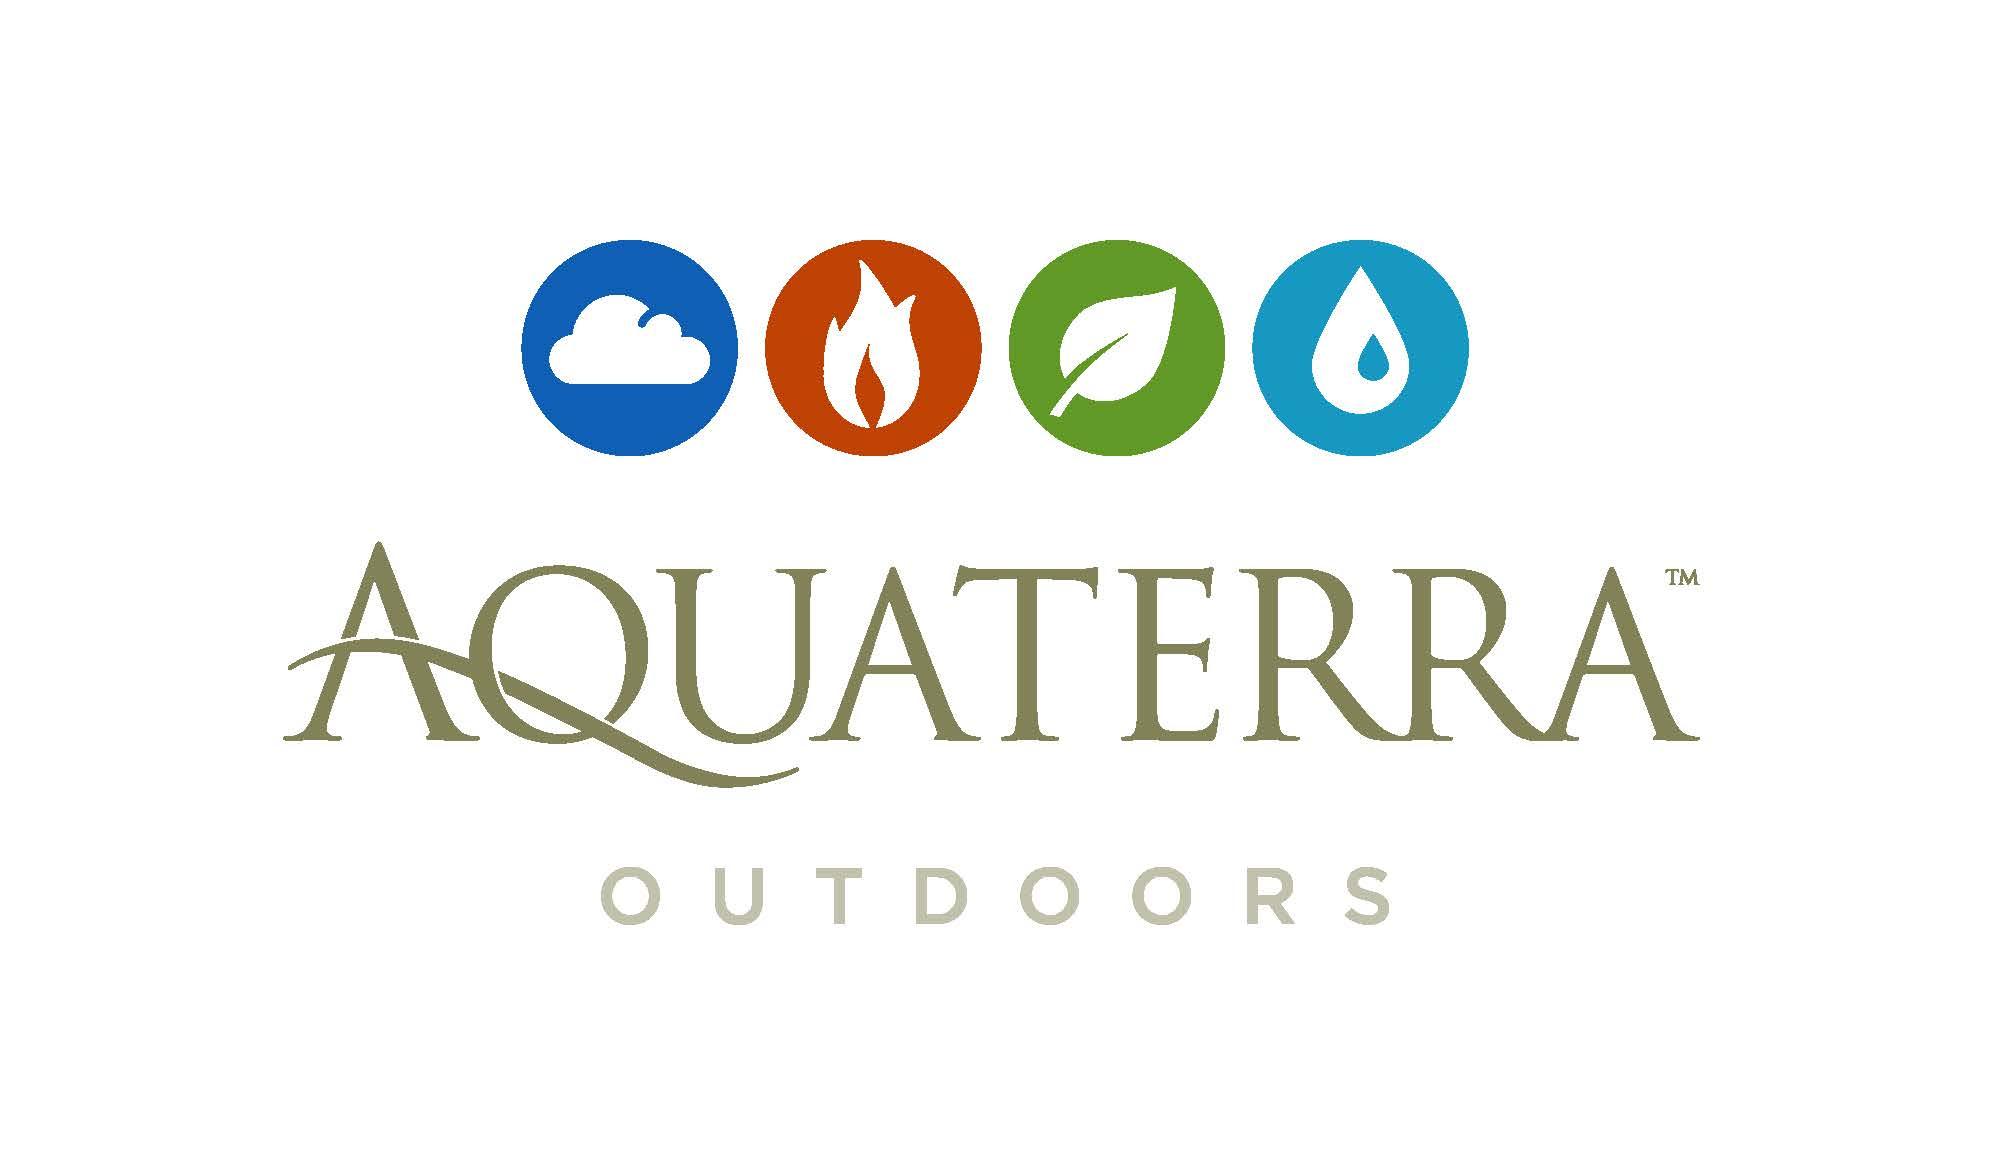 Tour of Homes - Aquaterra Outdoor Environments logo